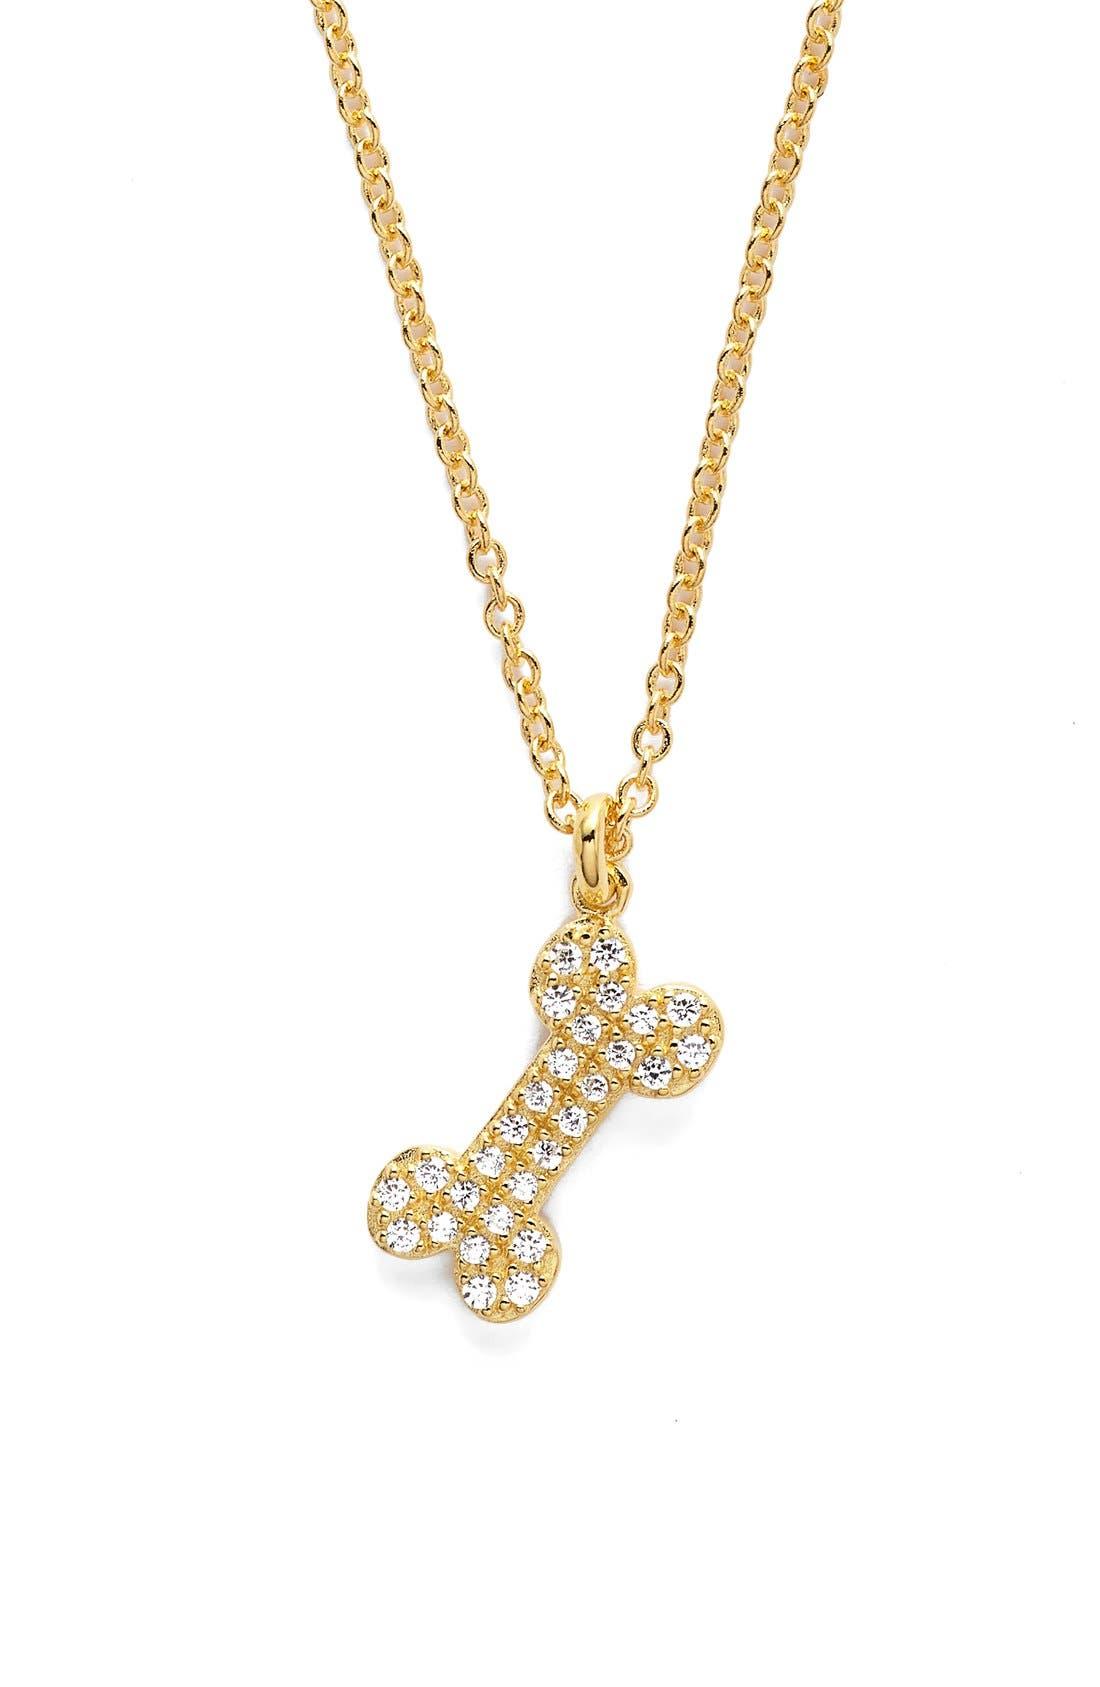 Alternate Image 1 Selected - Sugar Bean Jewelry Pavé Dog Bone Pendant Necklace